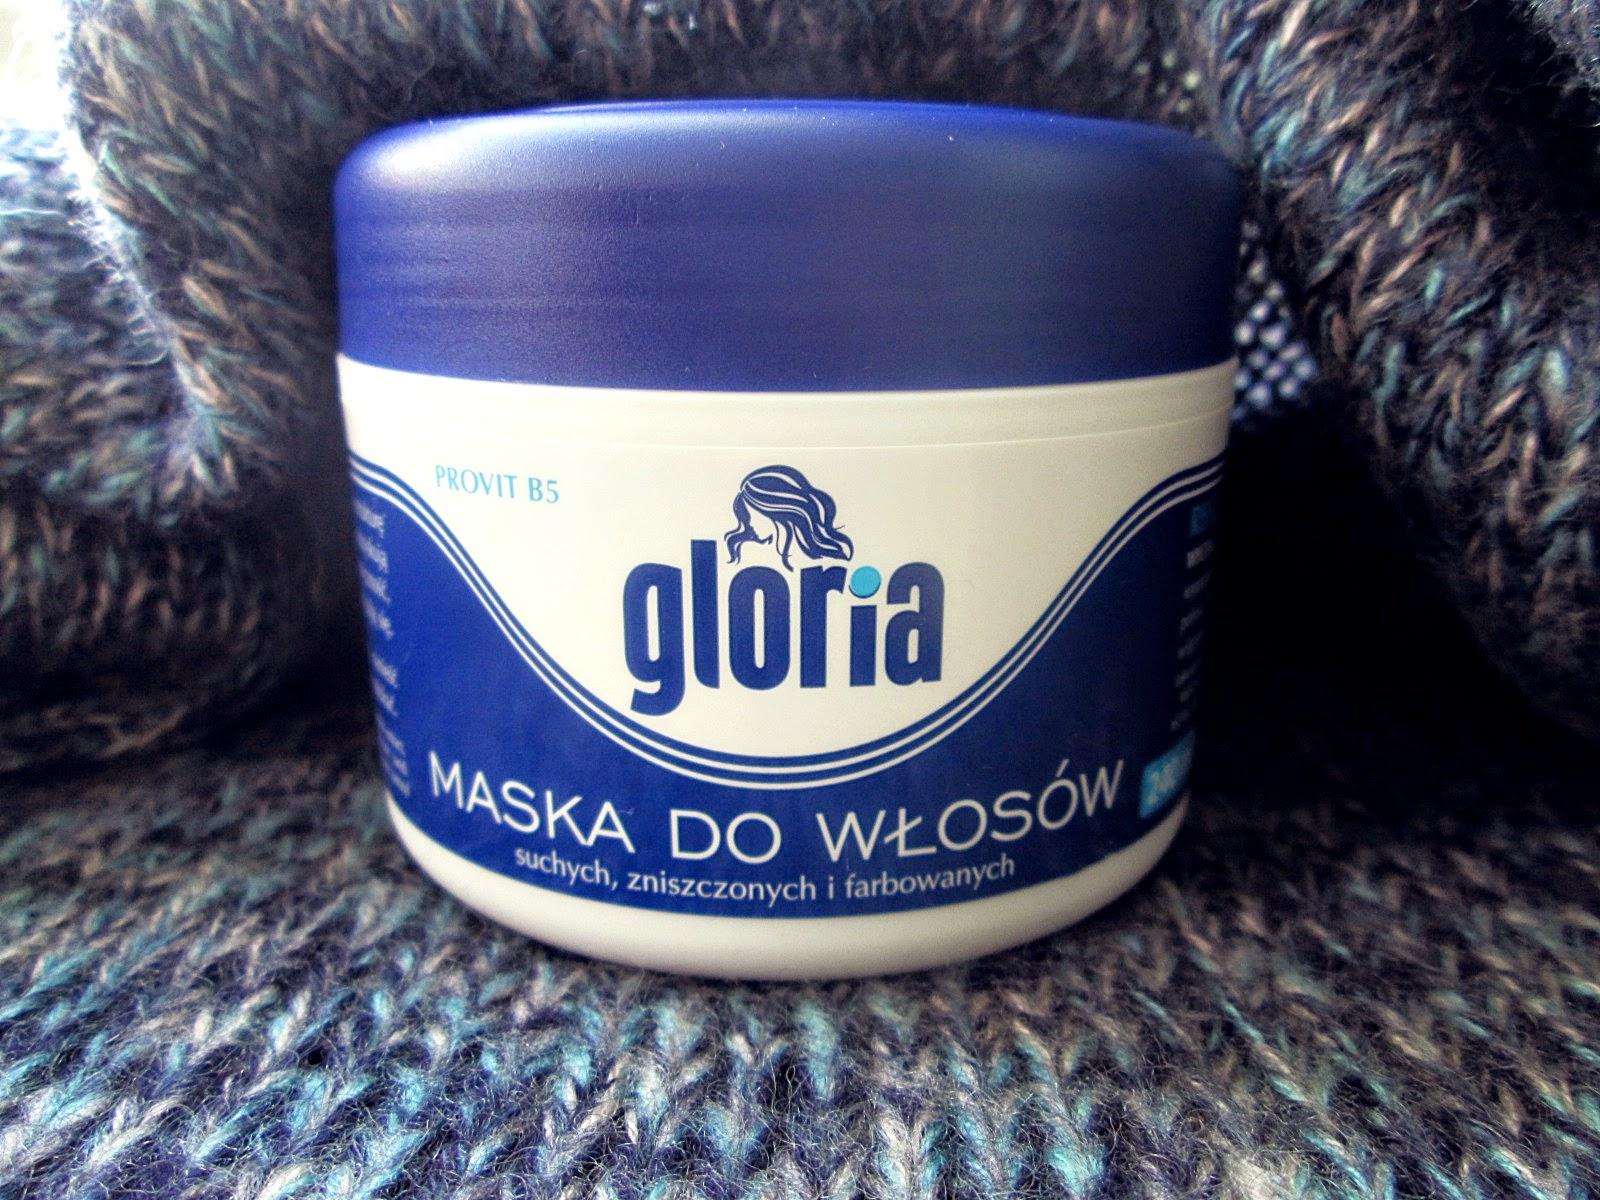 maska Gloria